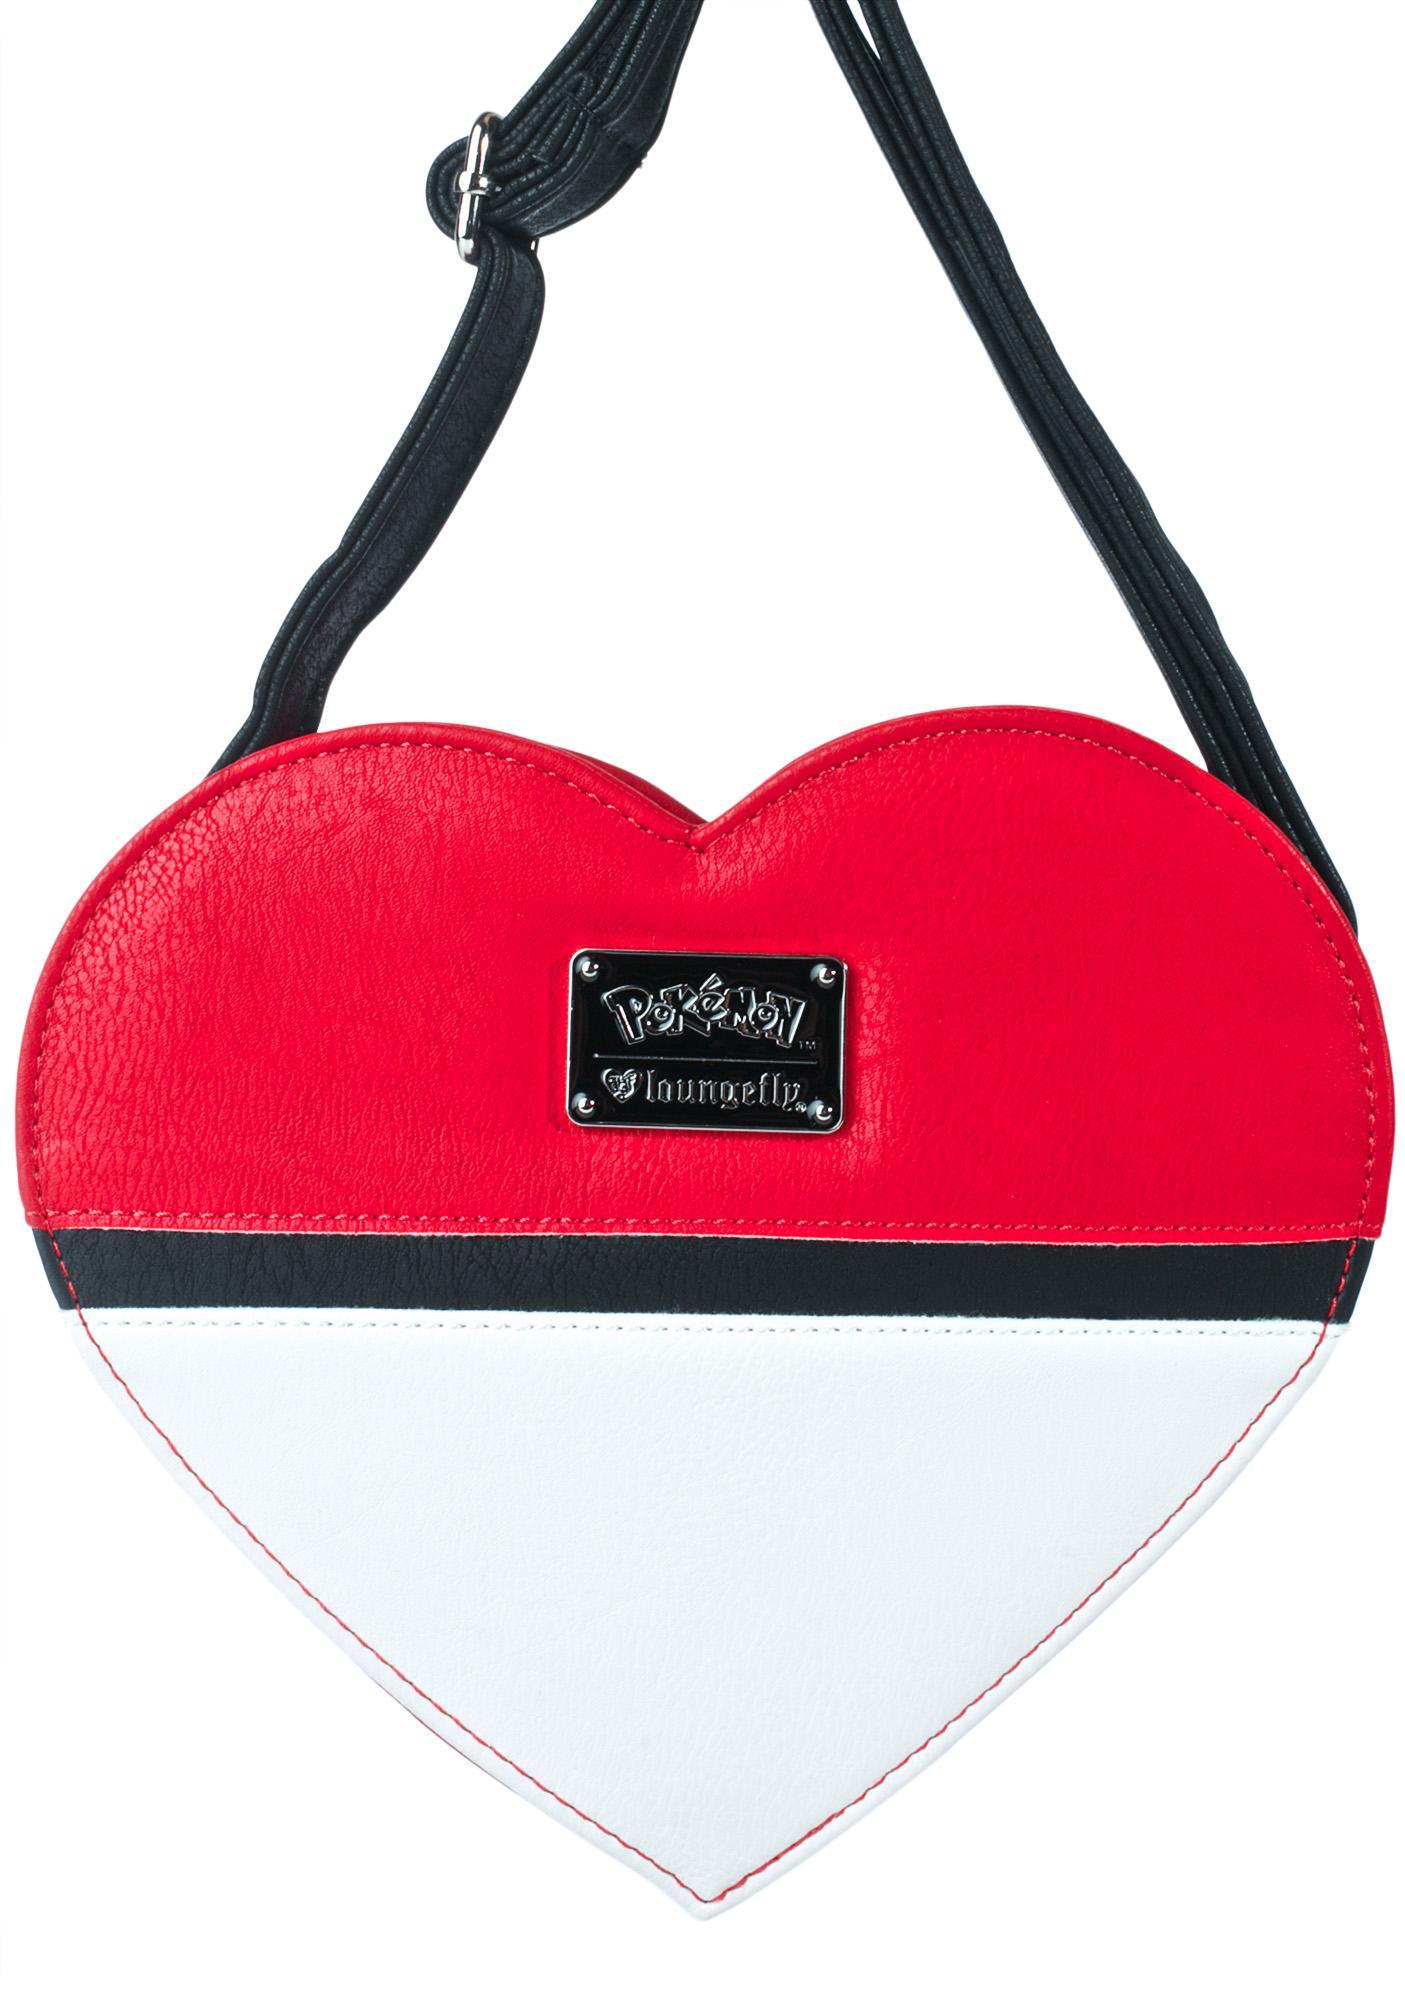 Loungefly X Pokémon Heart-Shaped Pokéball Crossbody Bag